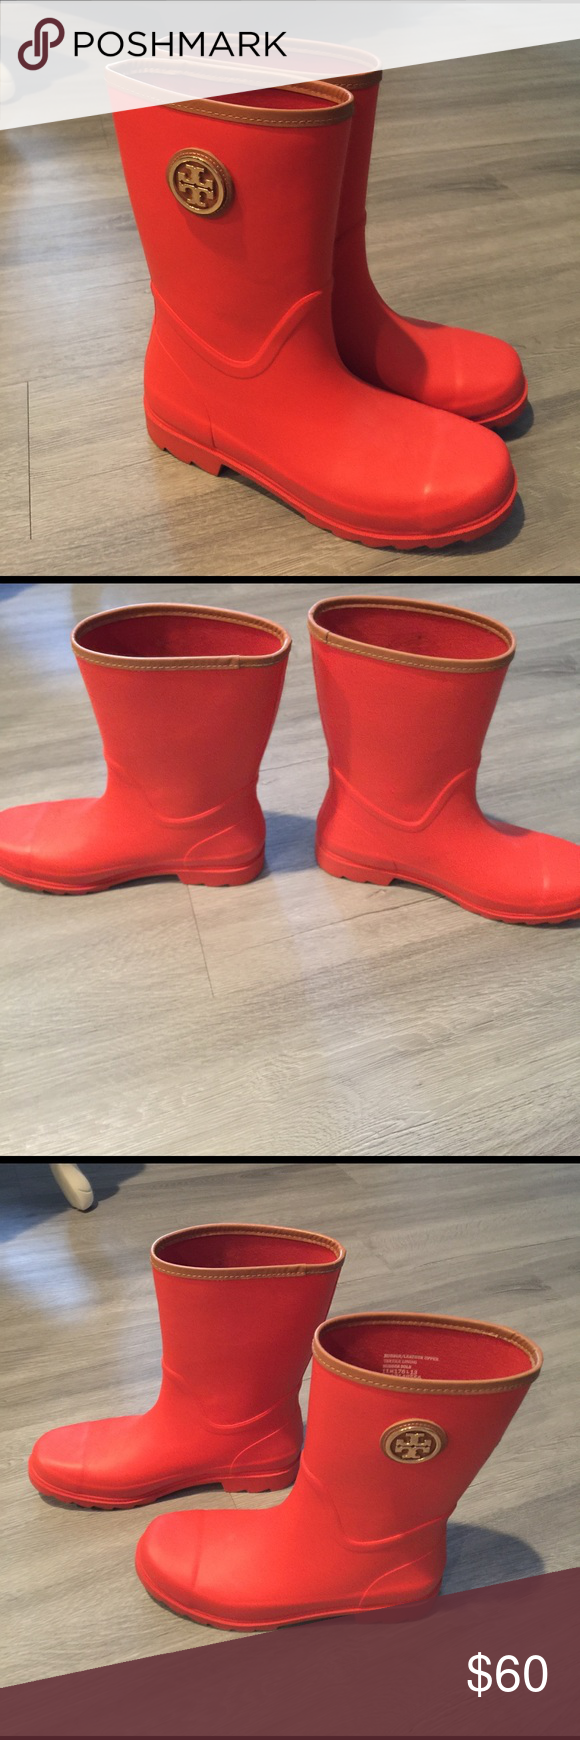 Tory Burch rain boots Worn twice! Very comfortable and waterproof Tory Burch Shoes Winter & Rain Boots